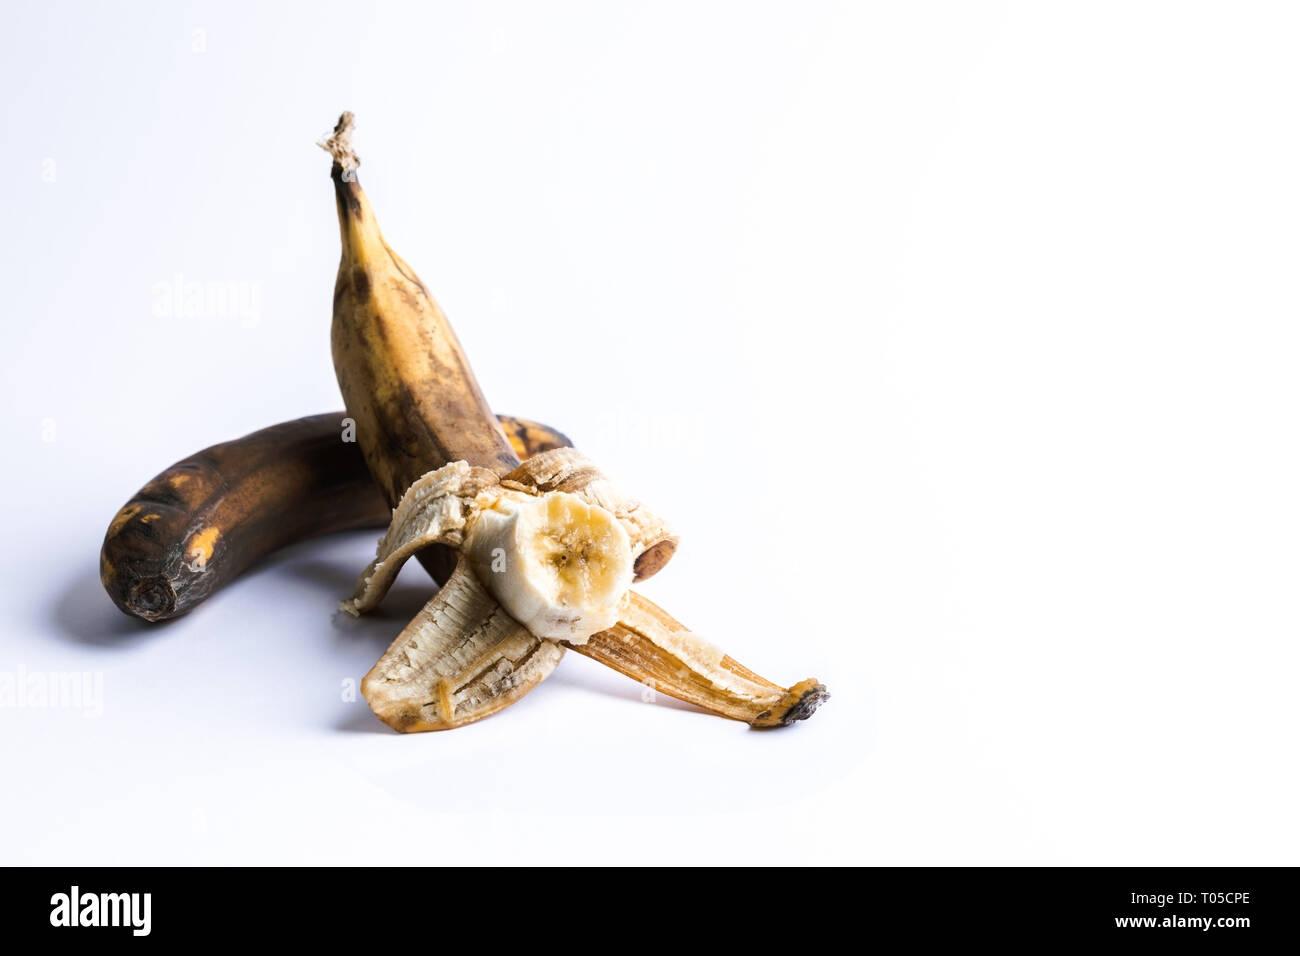 Two overripe blackened ugly bananas on white background. - Stock Image